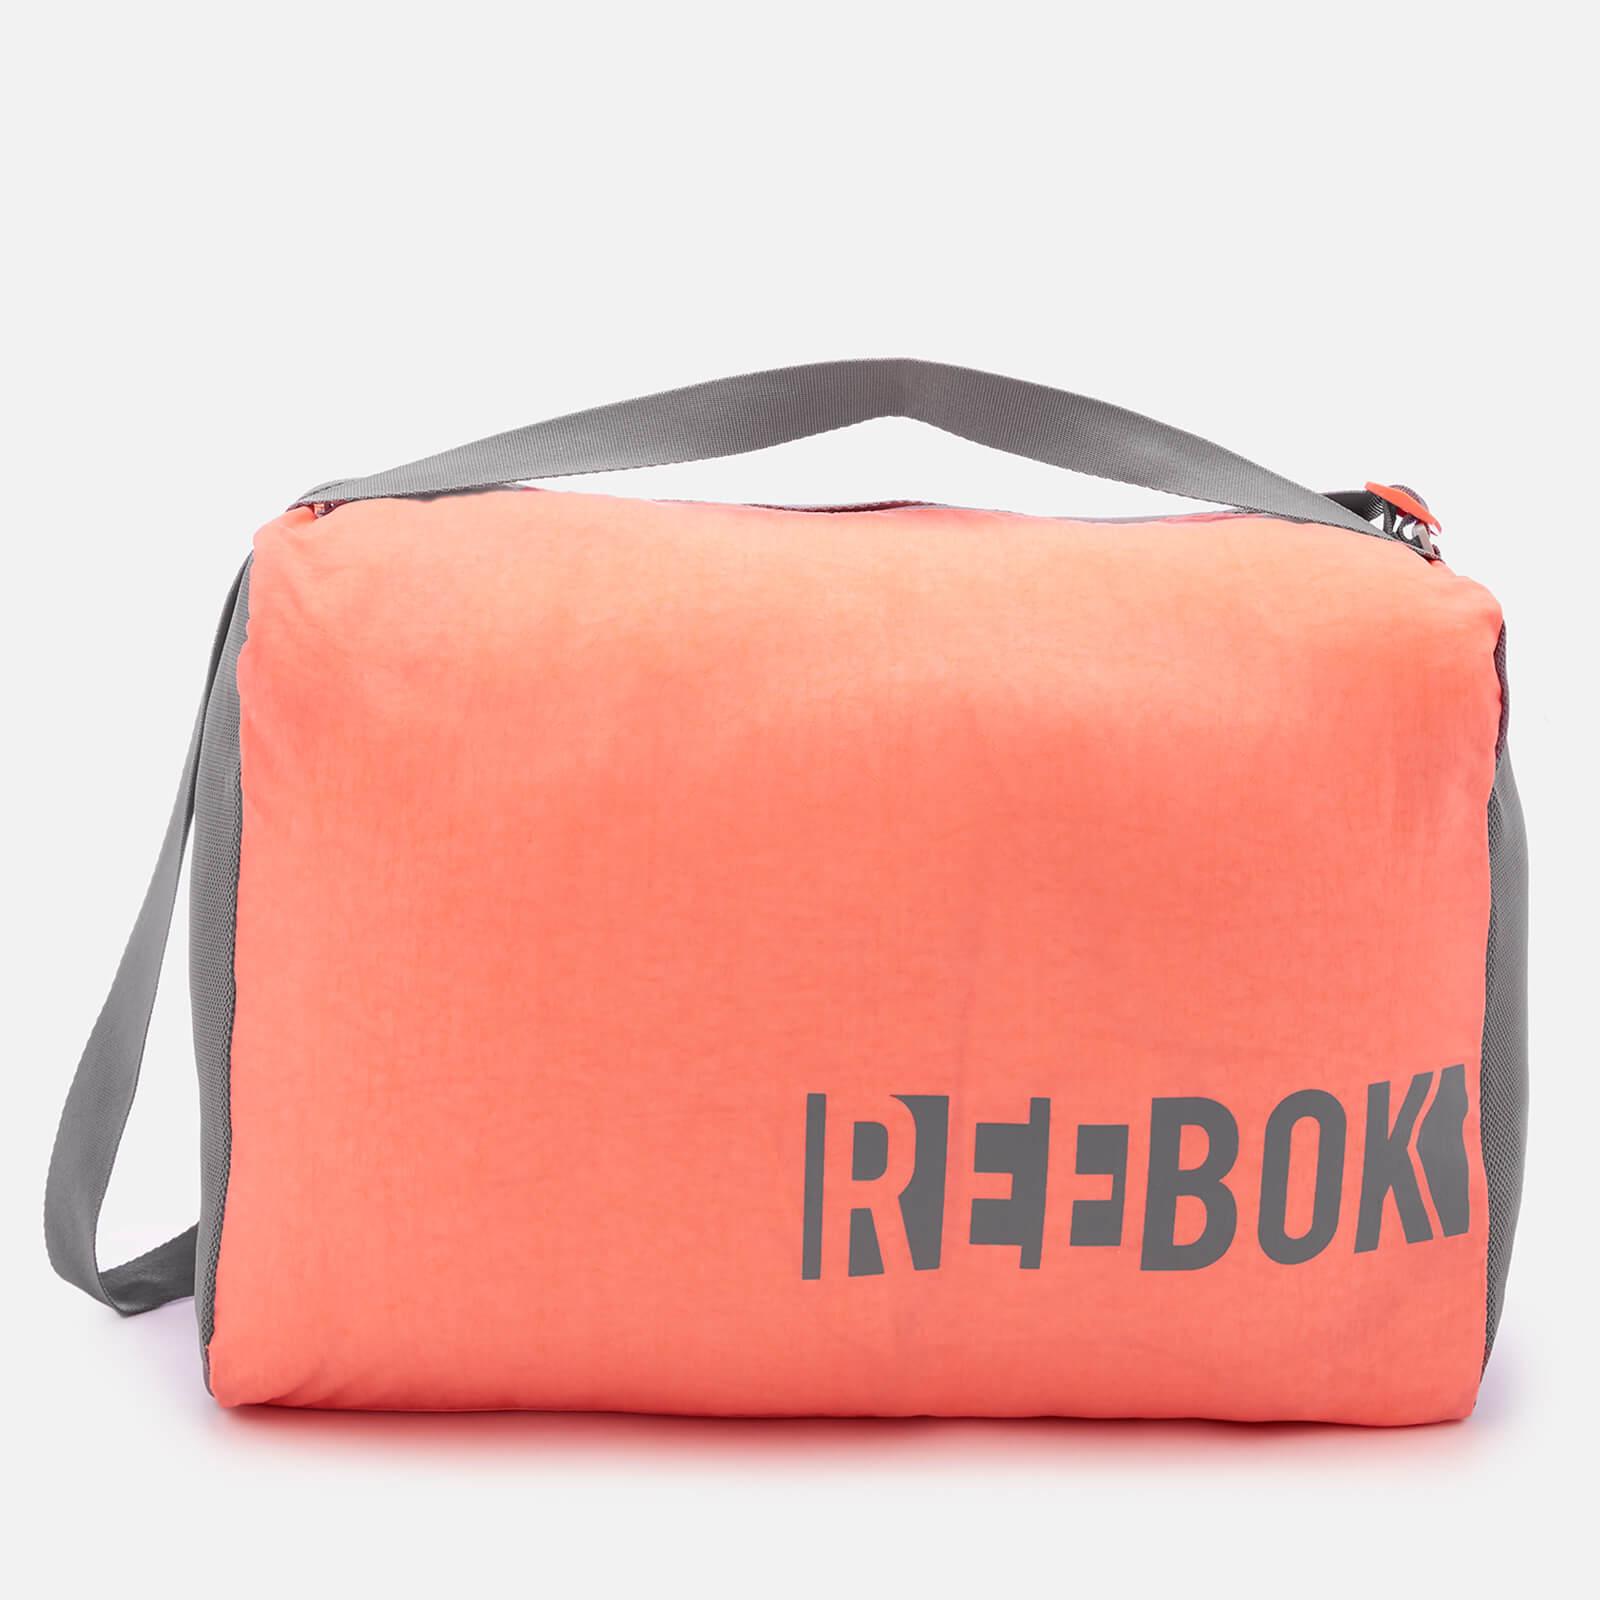 Reebok Women's Found Grip Bag - Pink